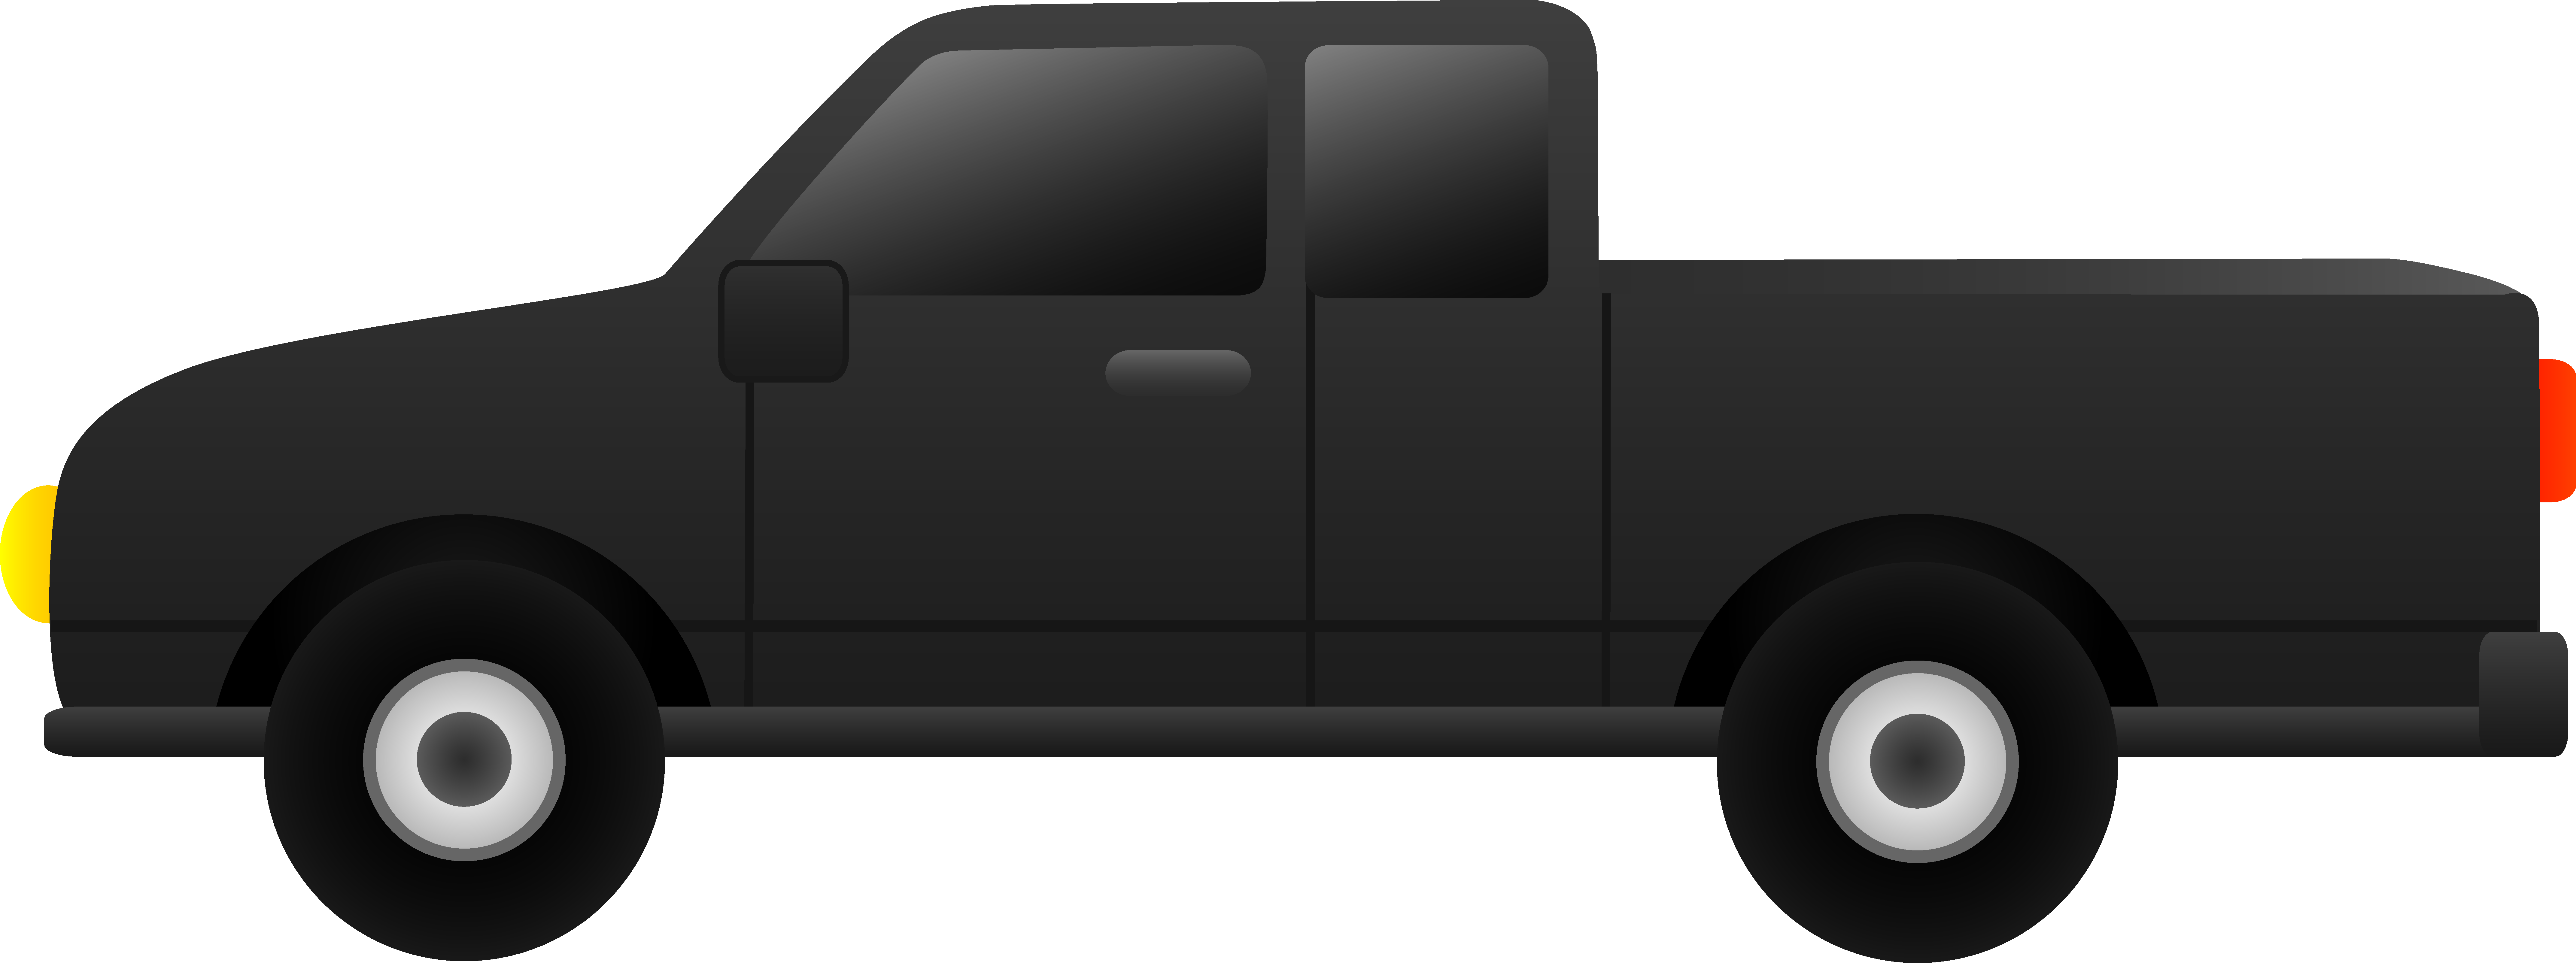 Black Truck Clipart.